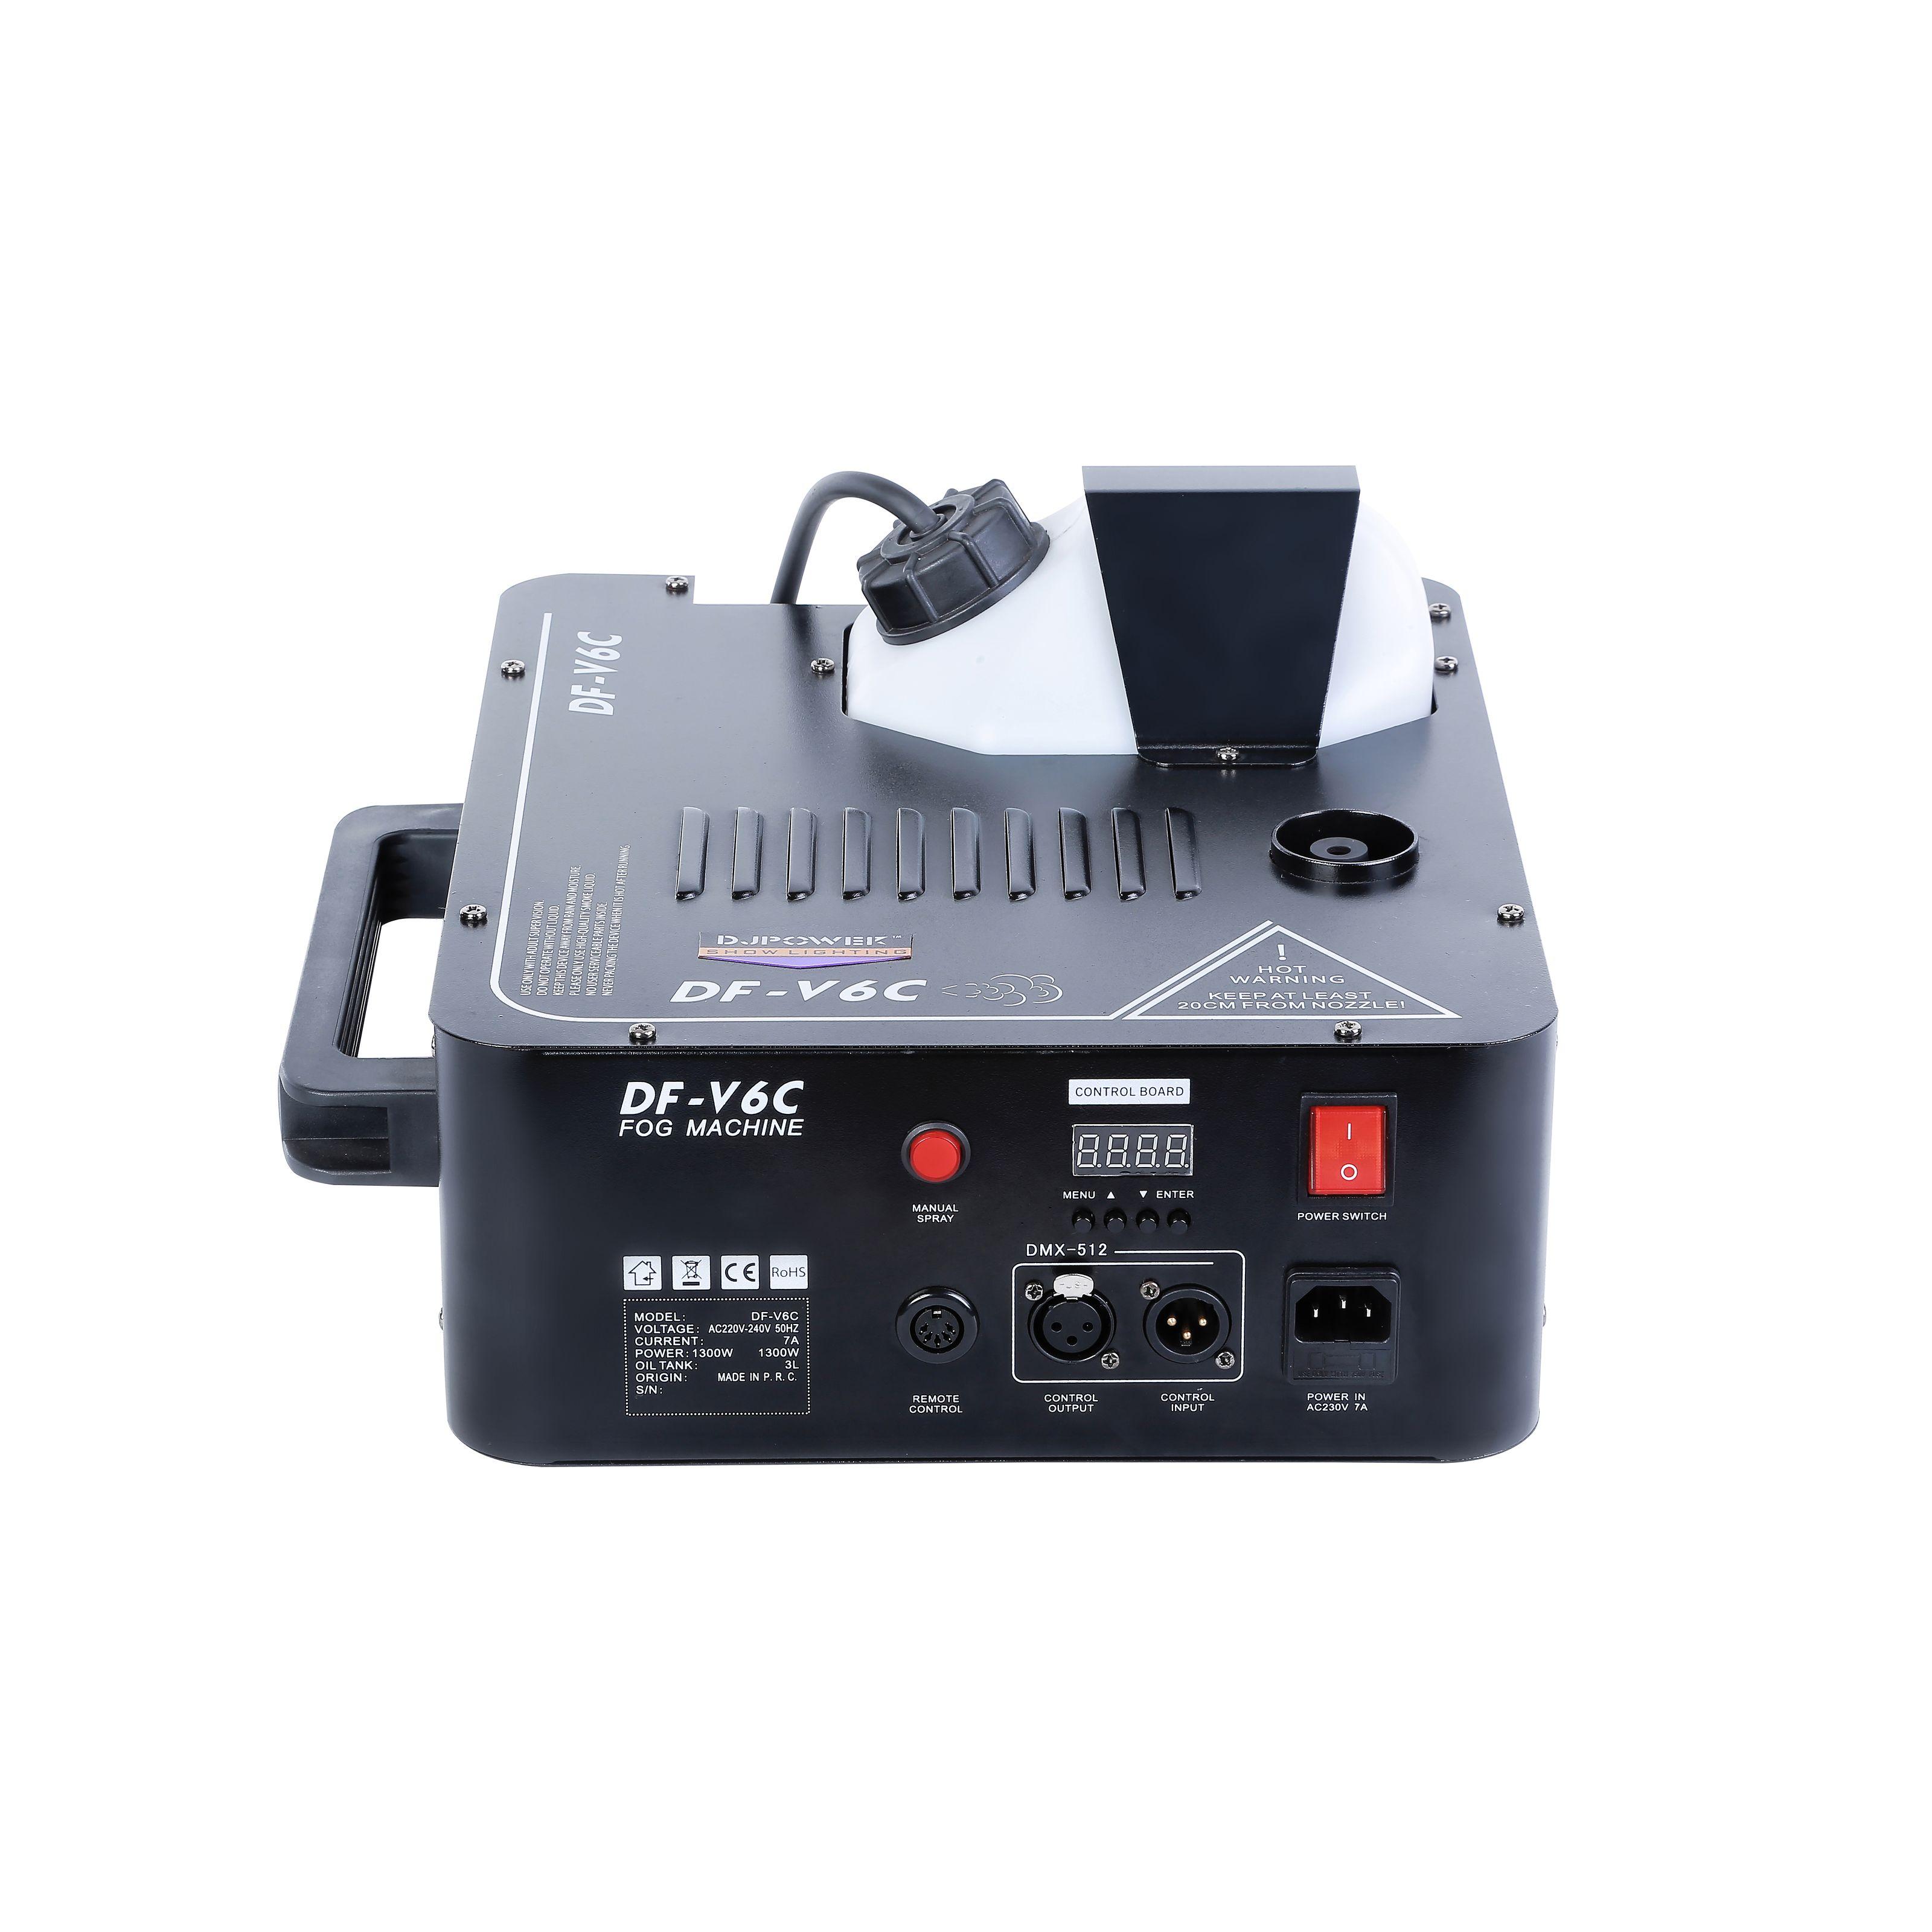 DJ Power - DF-V6C vertical sprayfogger 115297